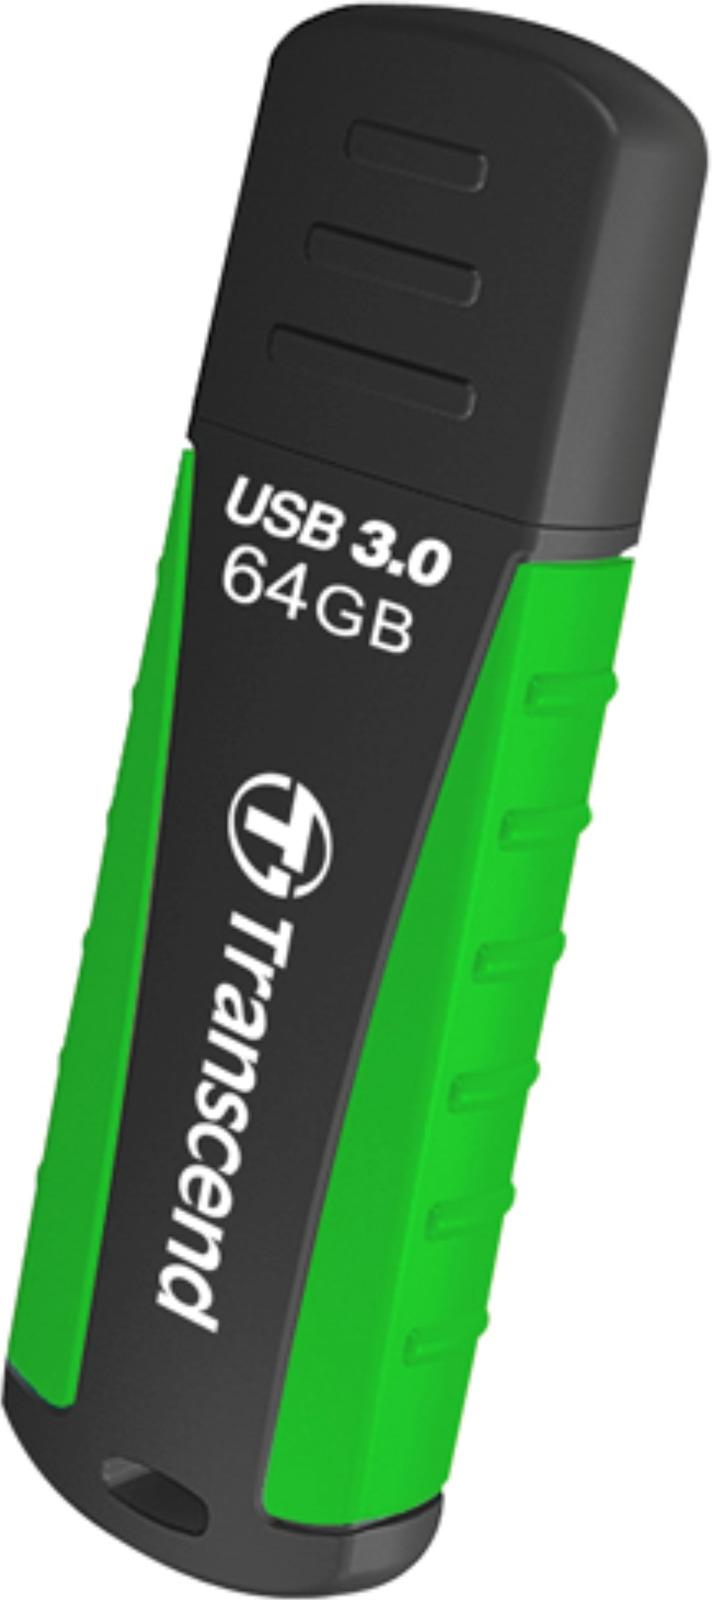 Флеш Диск Transcend 64Gb Jetflash 810 TS64GJF810 USB3.0 черный/зеленый флэш драйв leef ibridge3 32gb pink gold